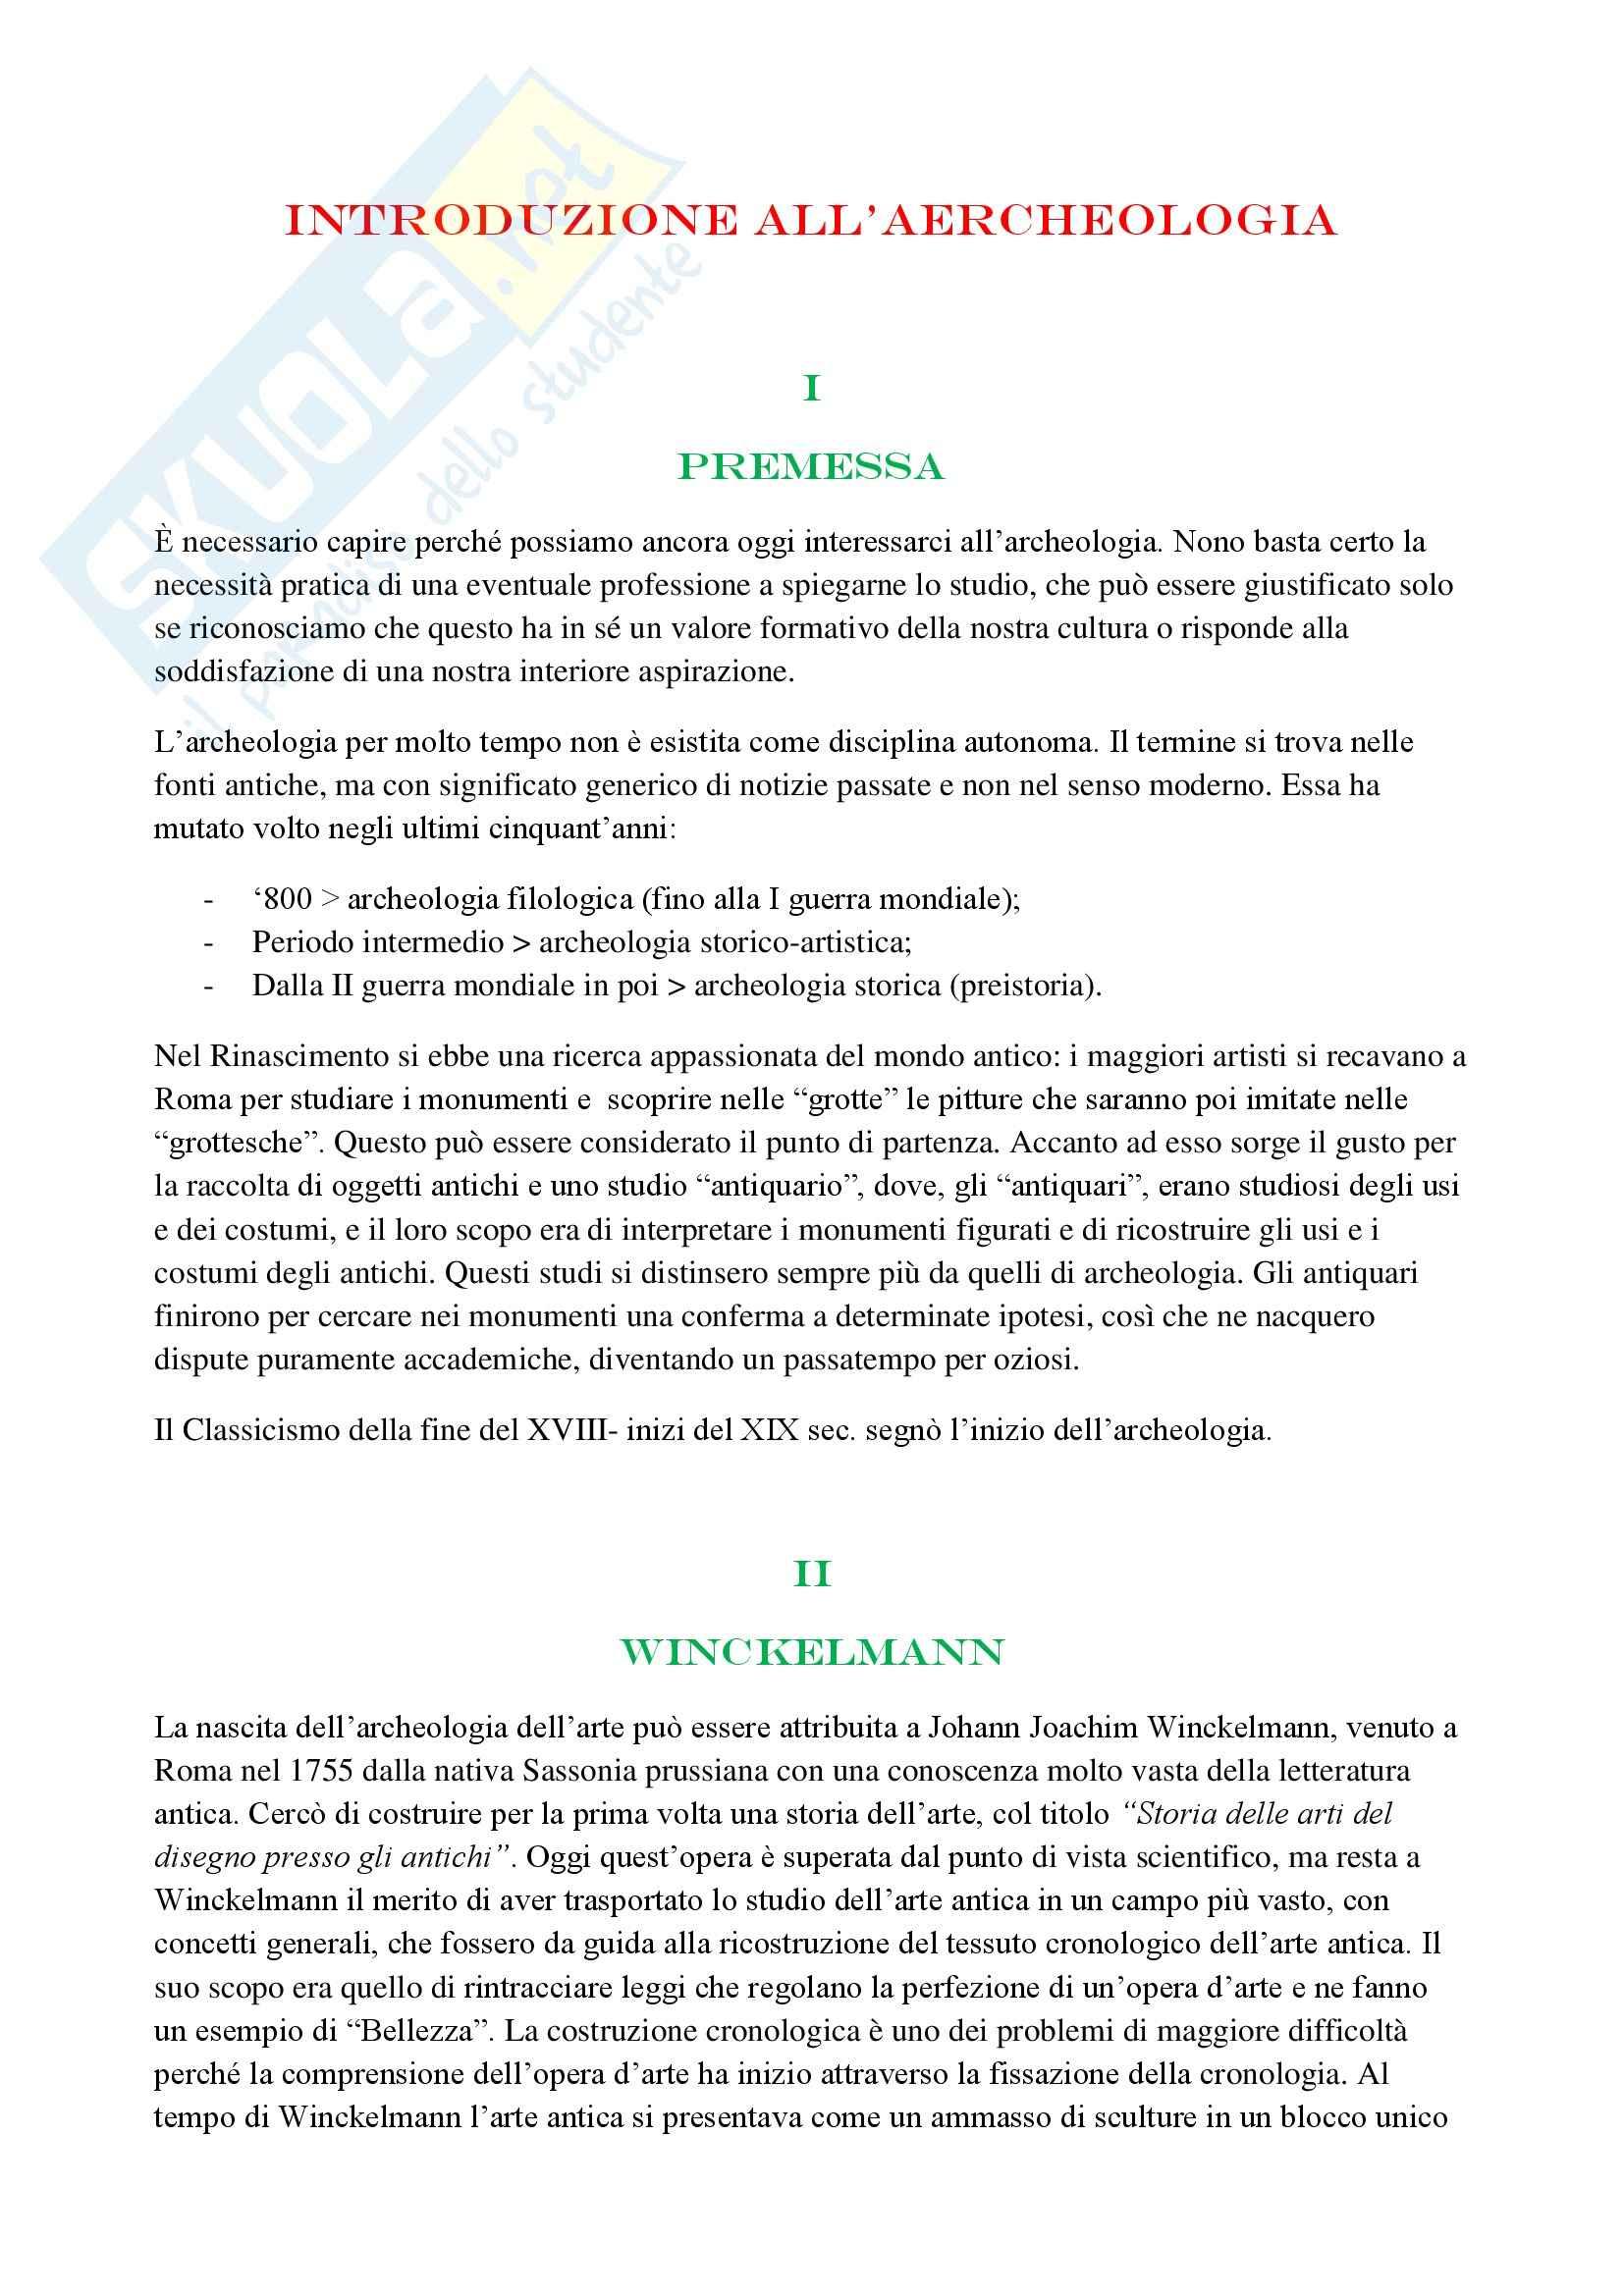 Introduzione all'archeologia, Bandinelli - Riassunto esame